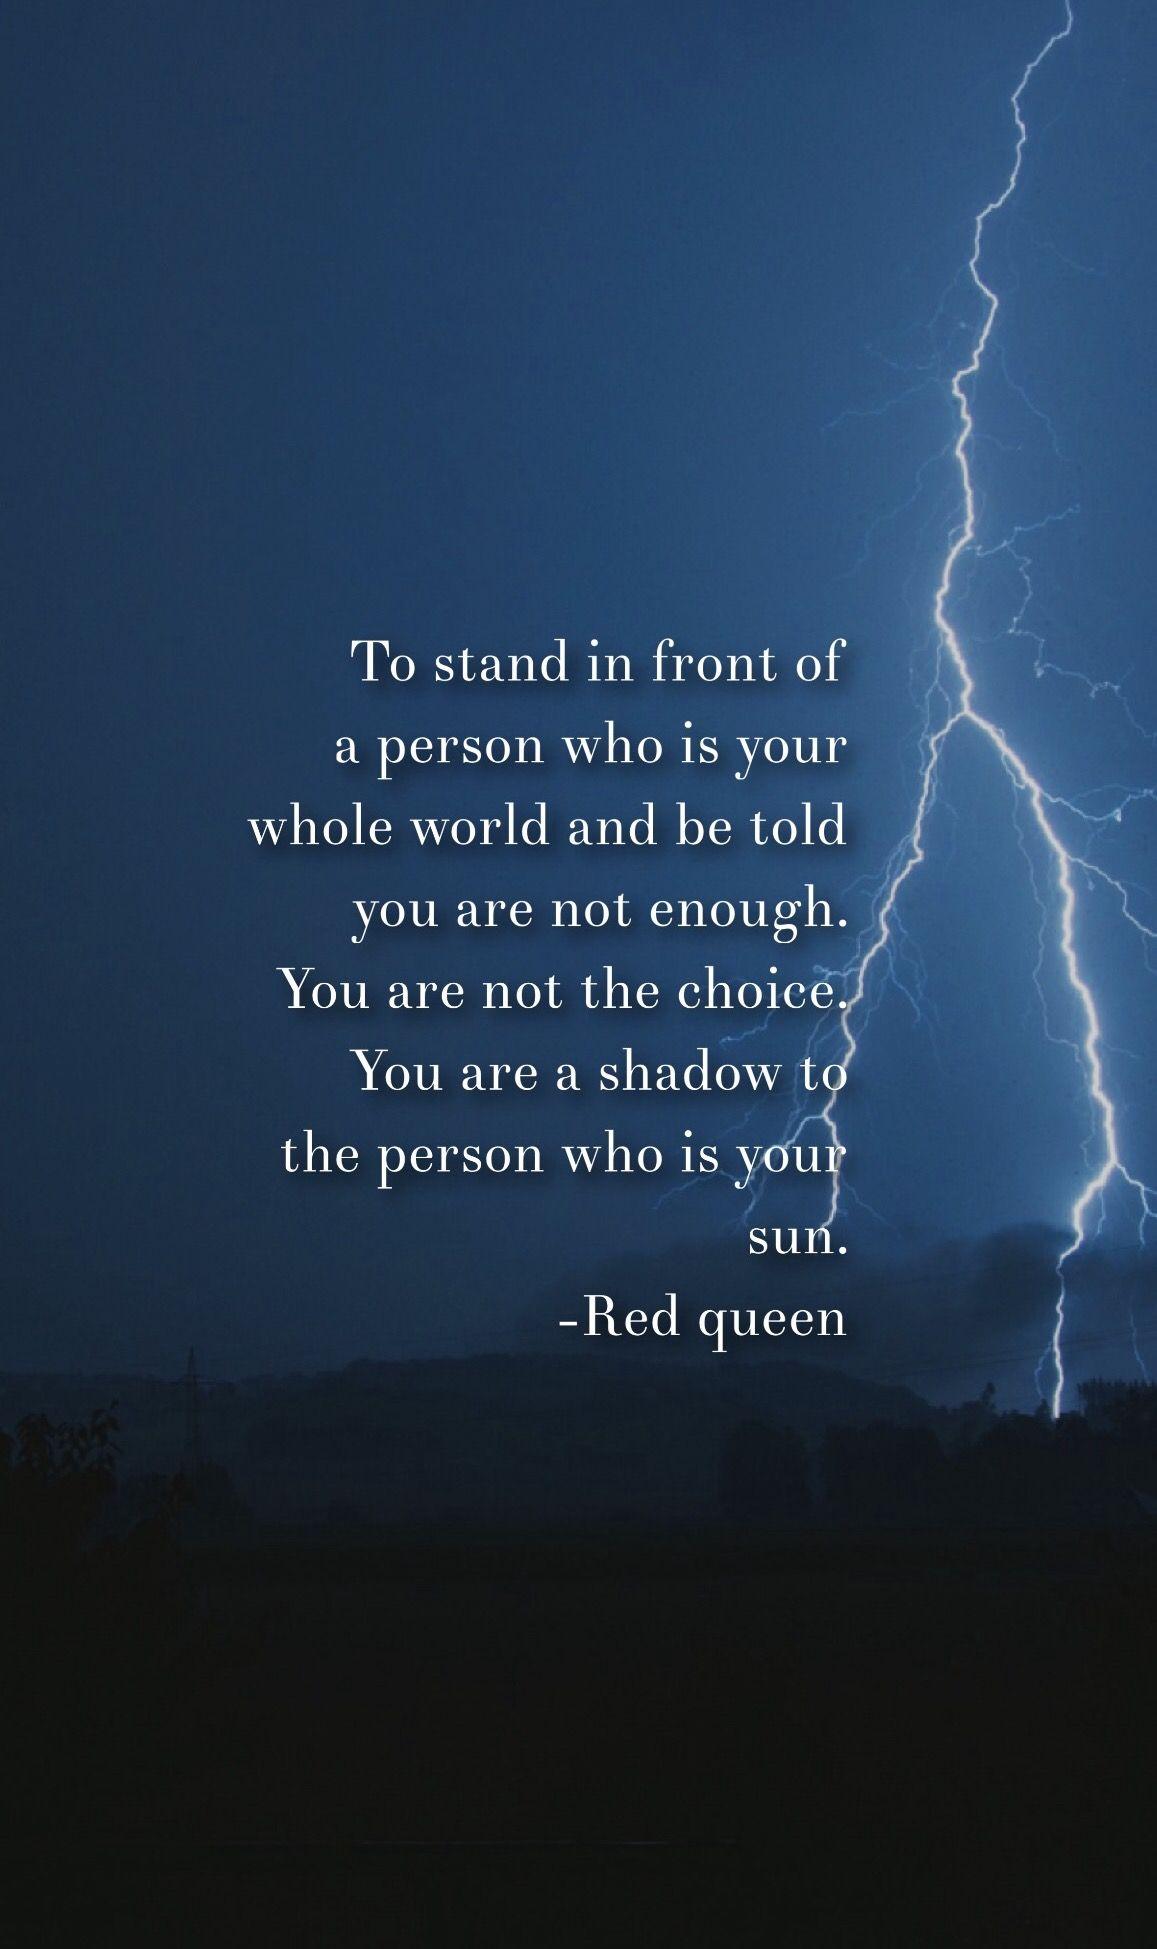 Red Queen Quote Red Queen Quotes Red Queen Red Queen Victoria Aveyard